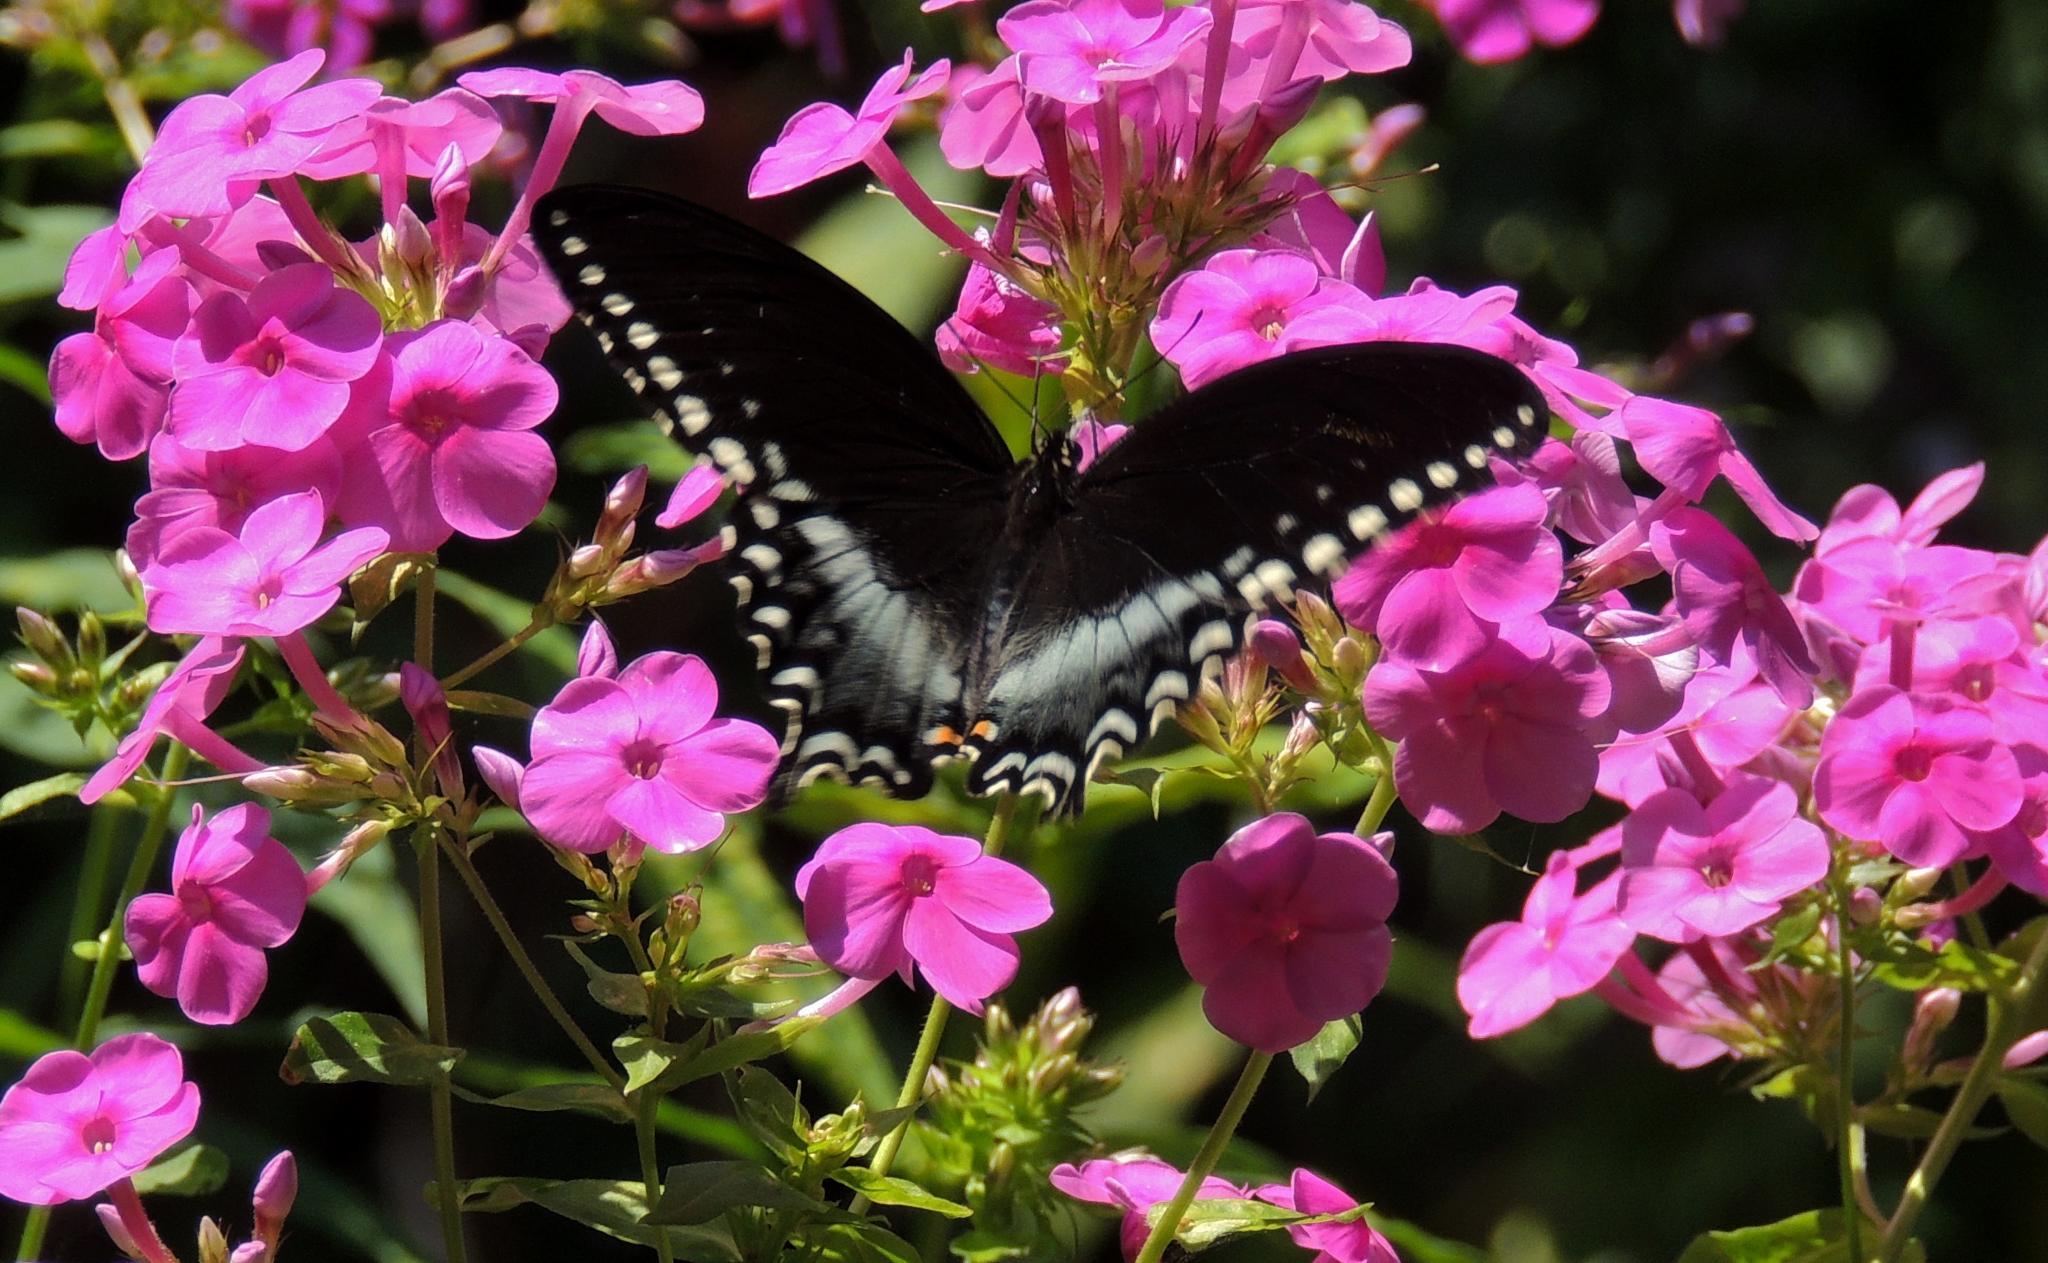 Butterfly on Phlox by carol.capozzi.18